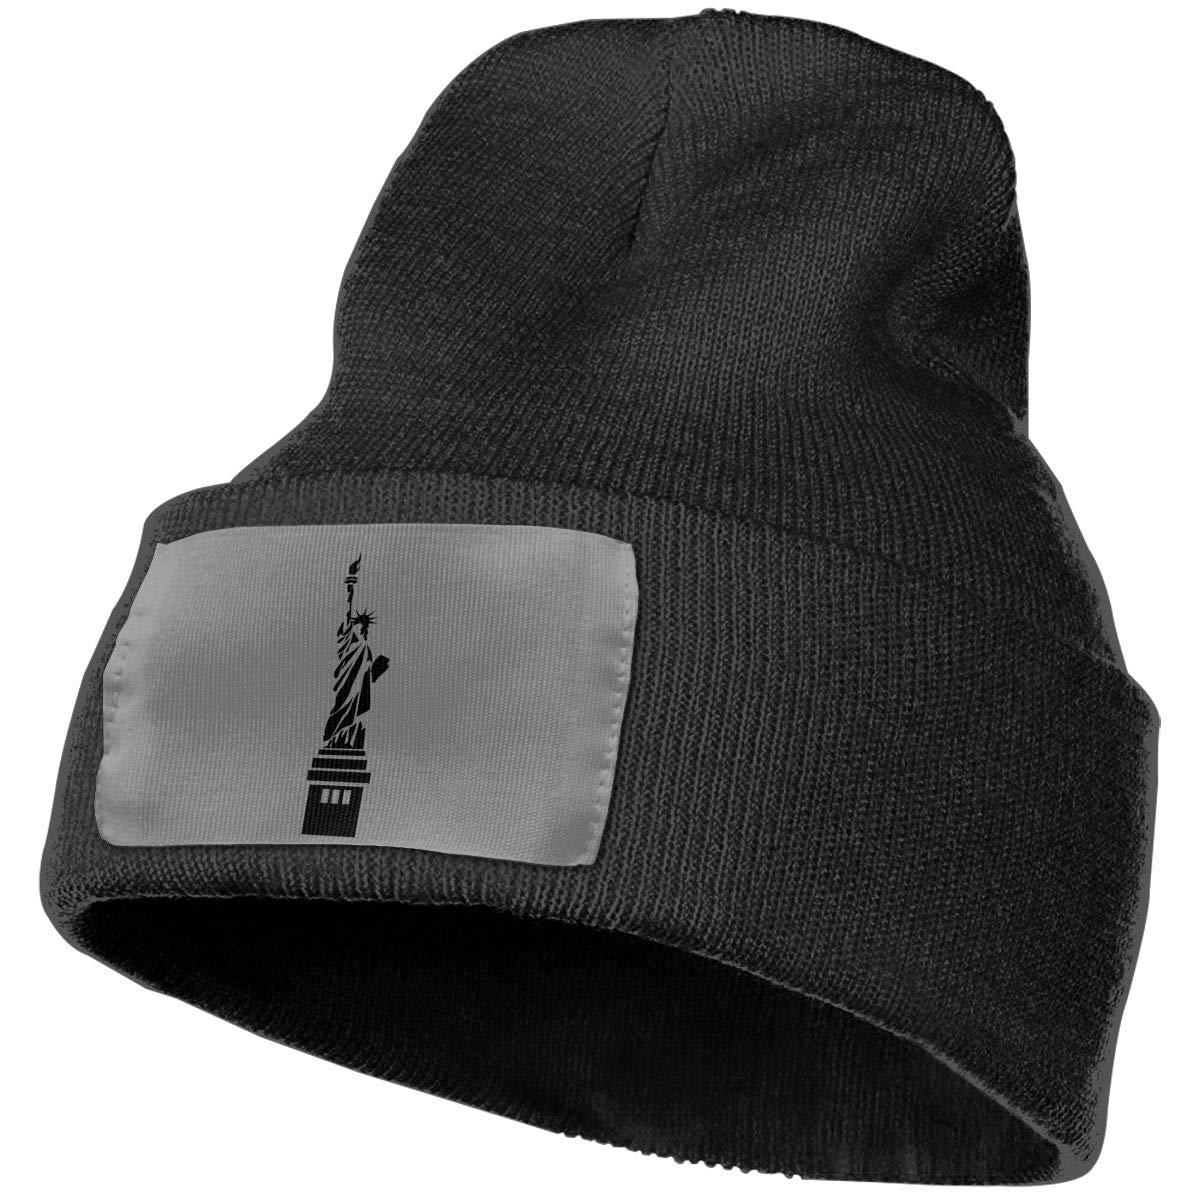 SLADDD1 USA Statue Warm Winter Hat Knit Beanie Skull Cap Cuff Beanie Hat Winter Hats for Men /& Women